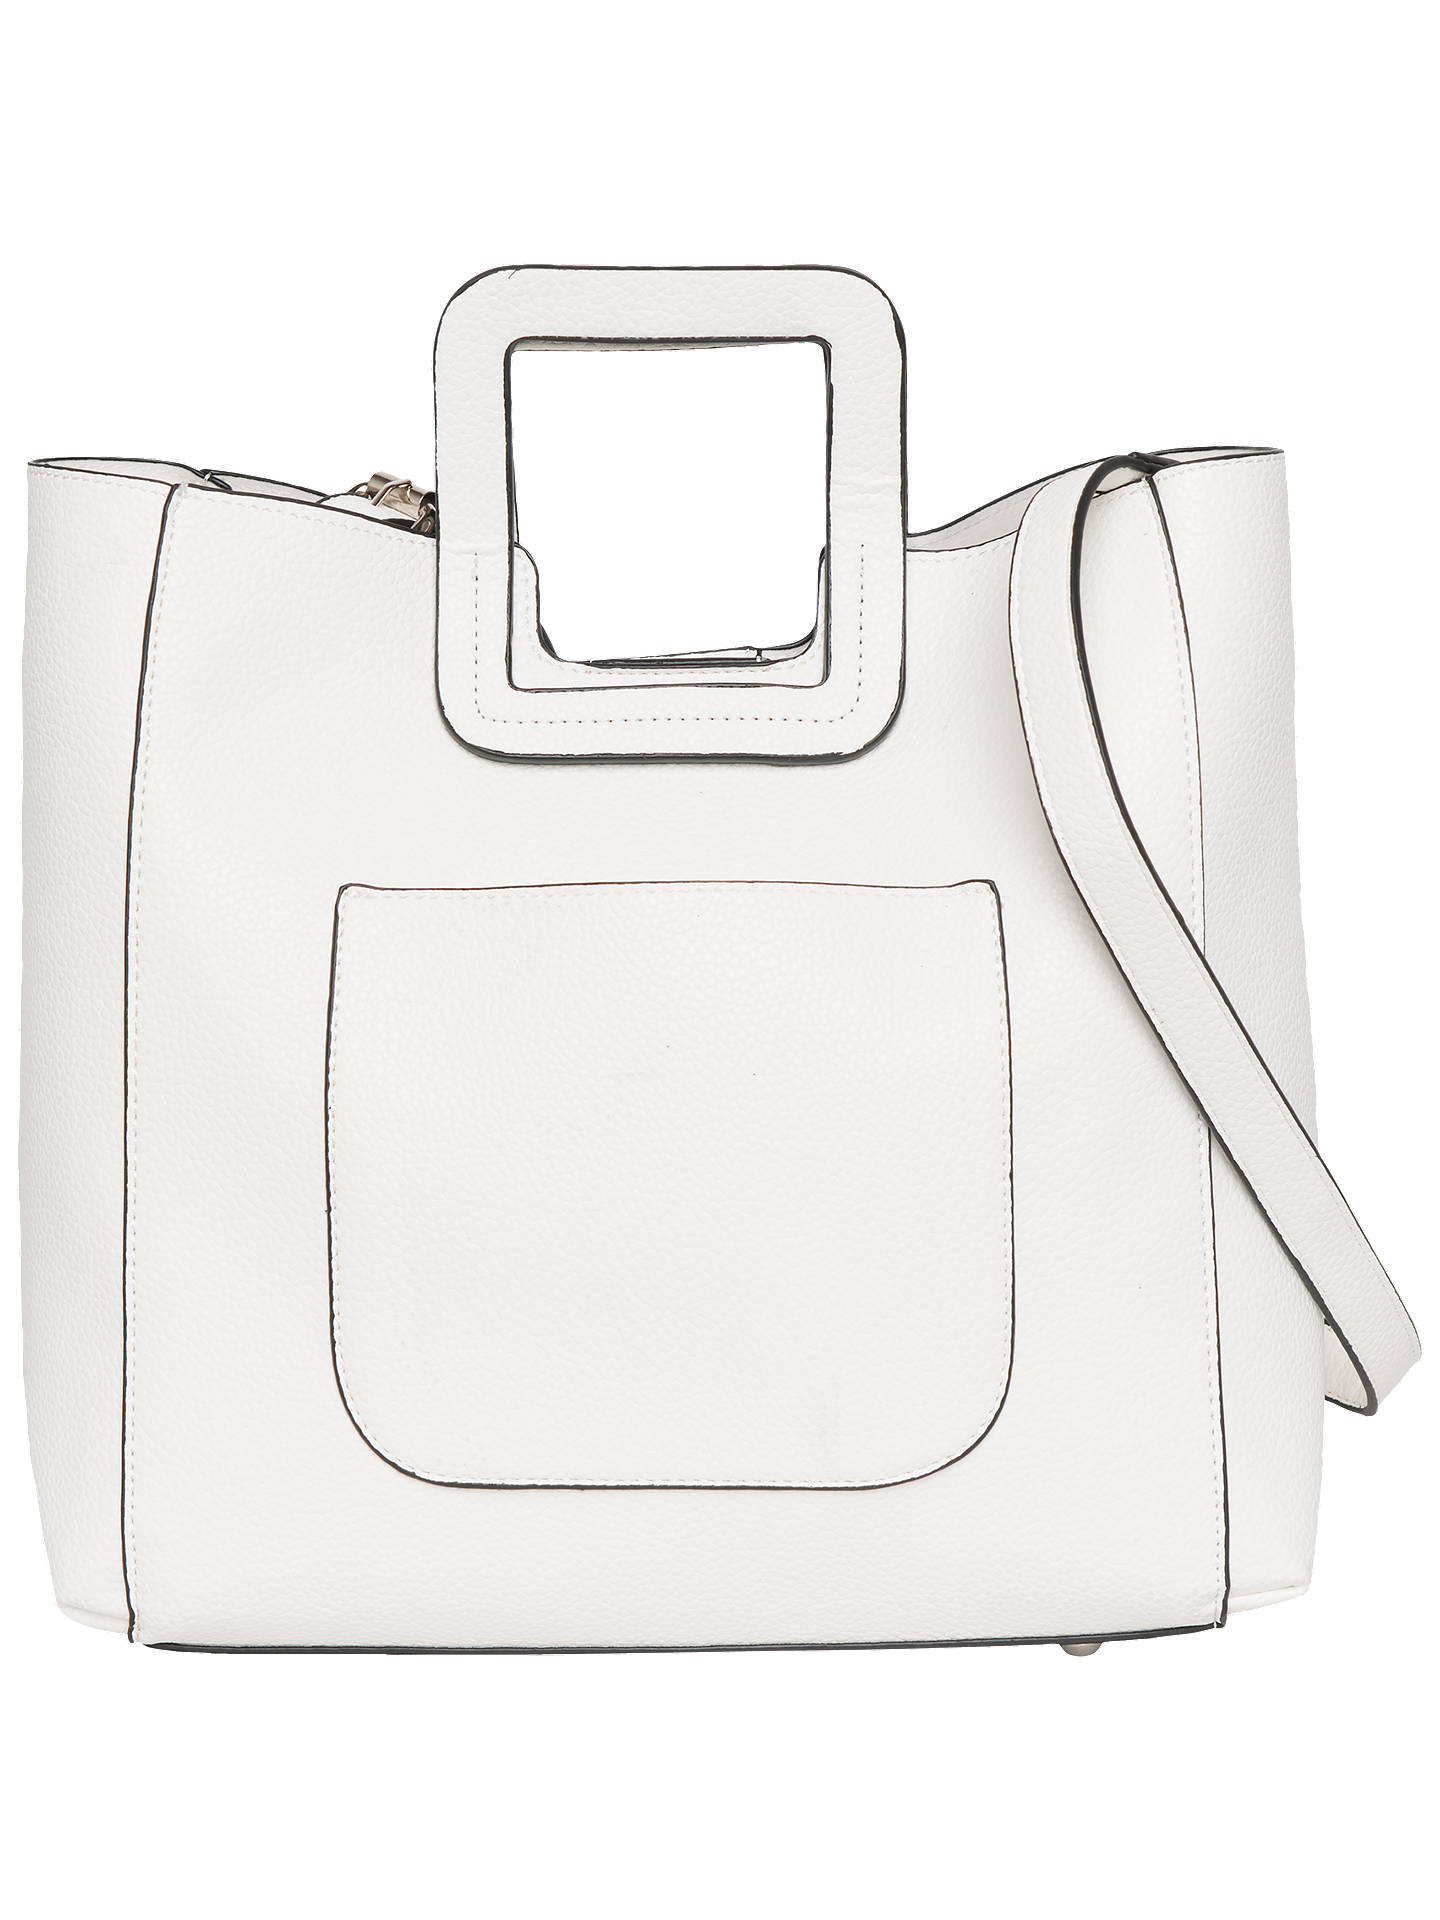 JL FC white bag.jpg